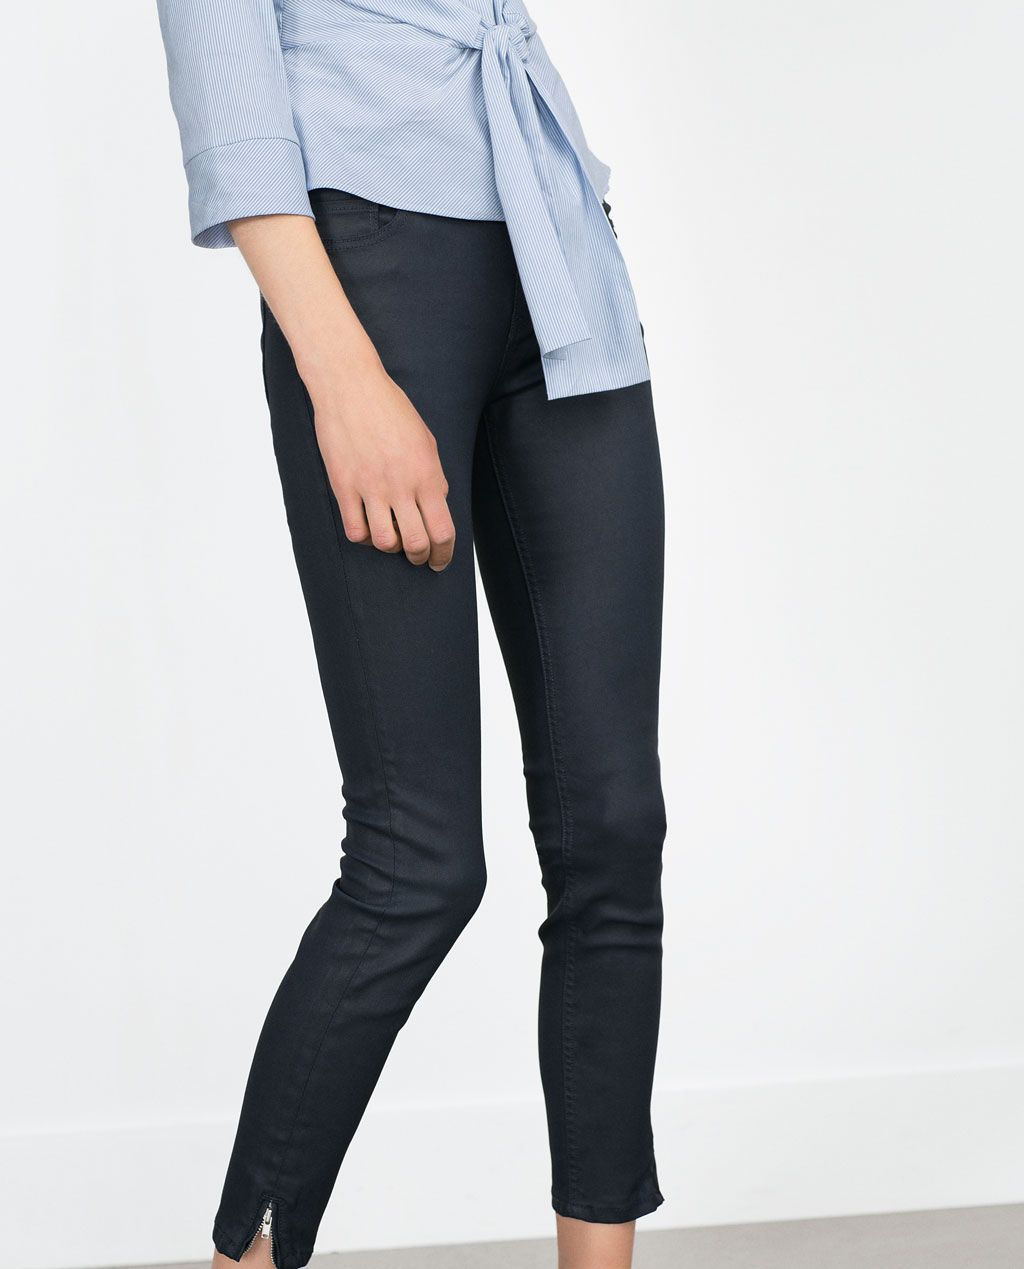 PANTALON EN JEAN ENDUIT-Skinny-Pantalons-FEMME   ZARA France ... ca58513a87d